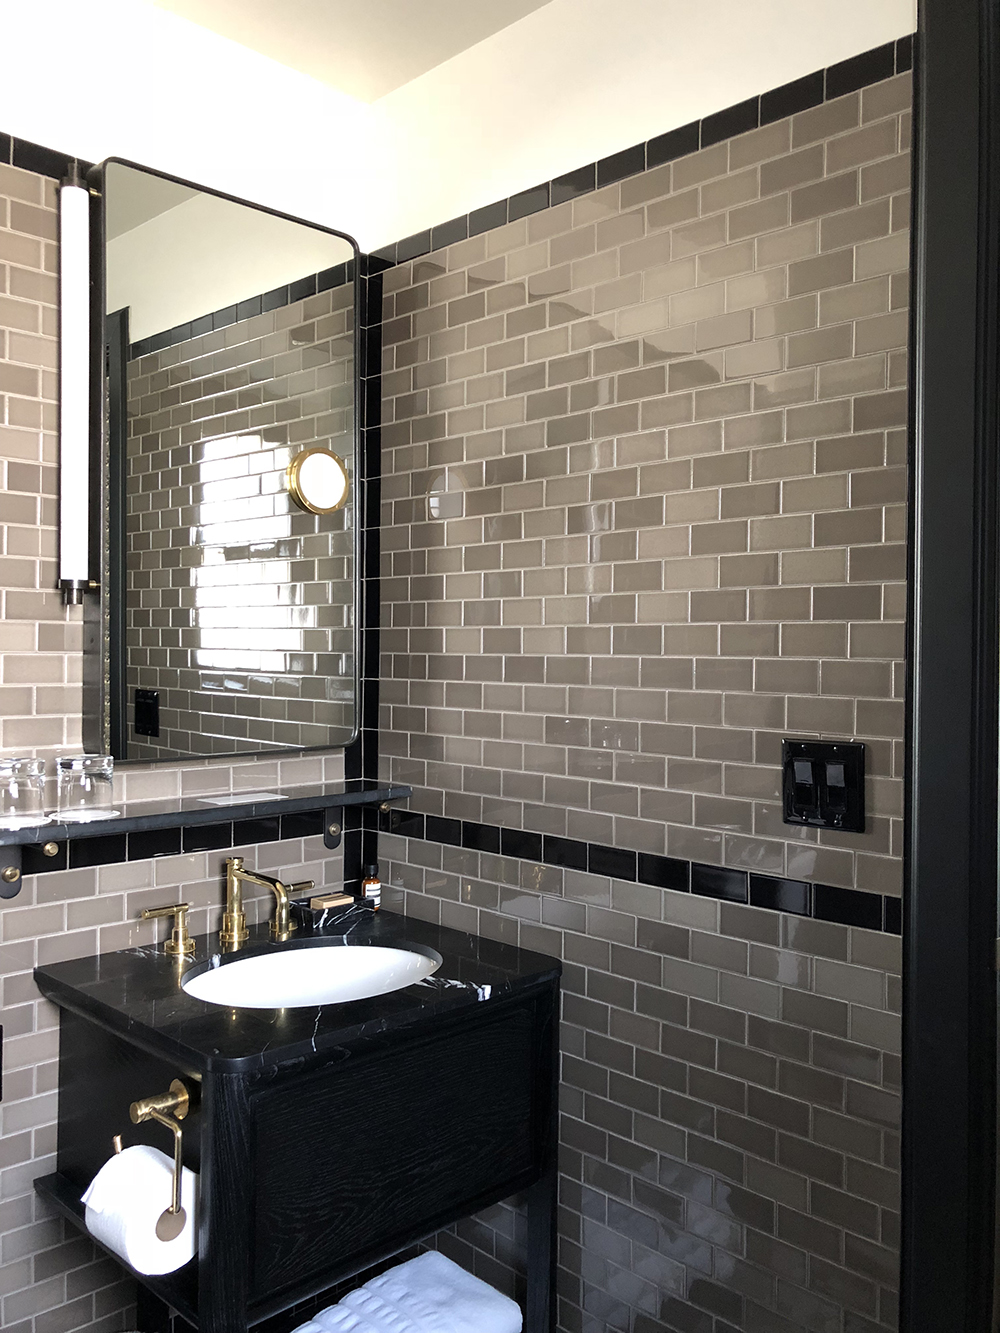 Kelly Wearstler Bathroom - Room For Tuesday